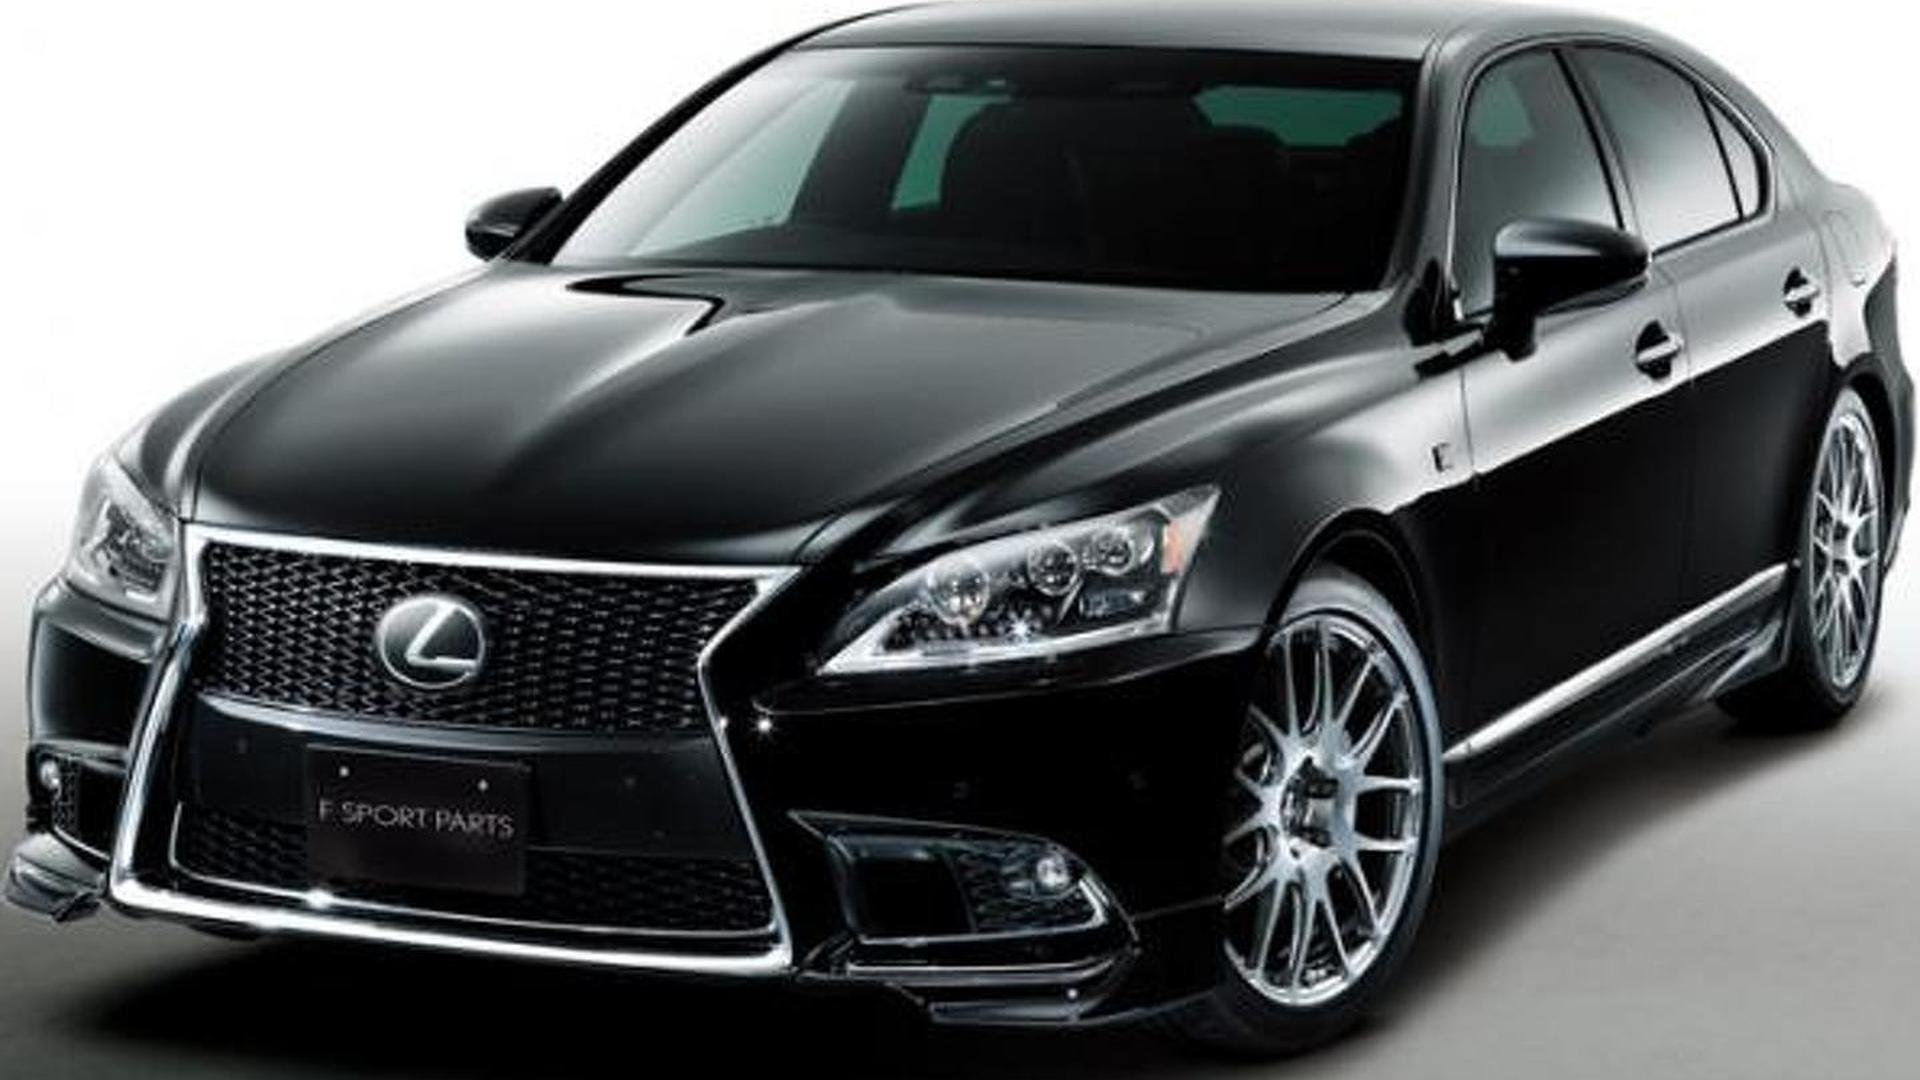 https://icdn-2.motor1.com/images/mgl/6ej17/s1/2012-338907-2013-lexus-ls-460-f-sport-with-trd-body-kit1.jpg